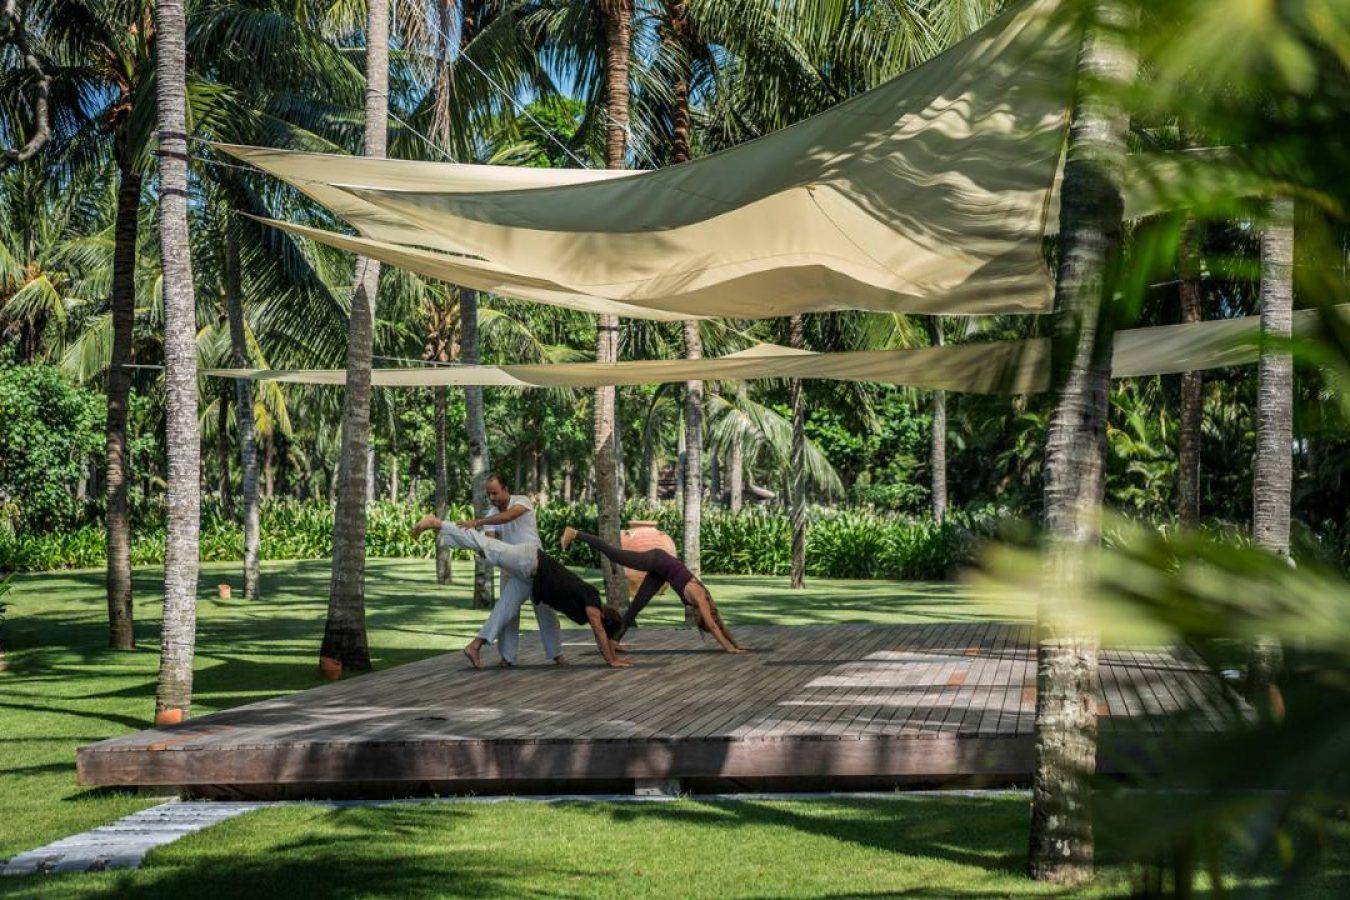 Four Seasons Resort The Nam Hai - The Luxury Spa Edit